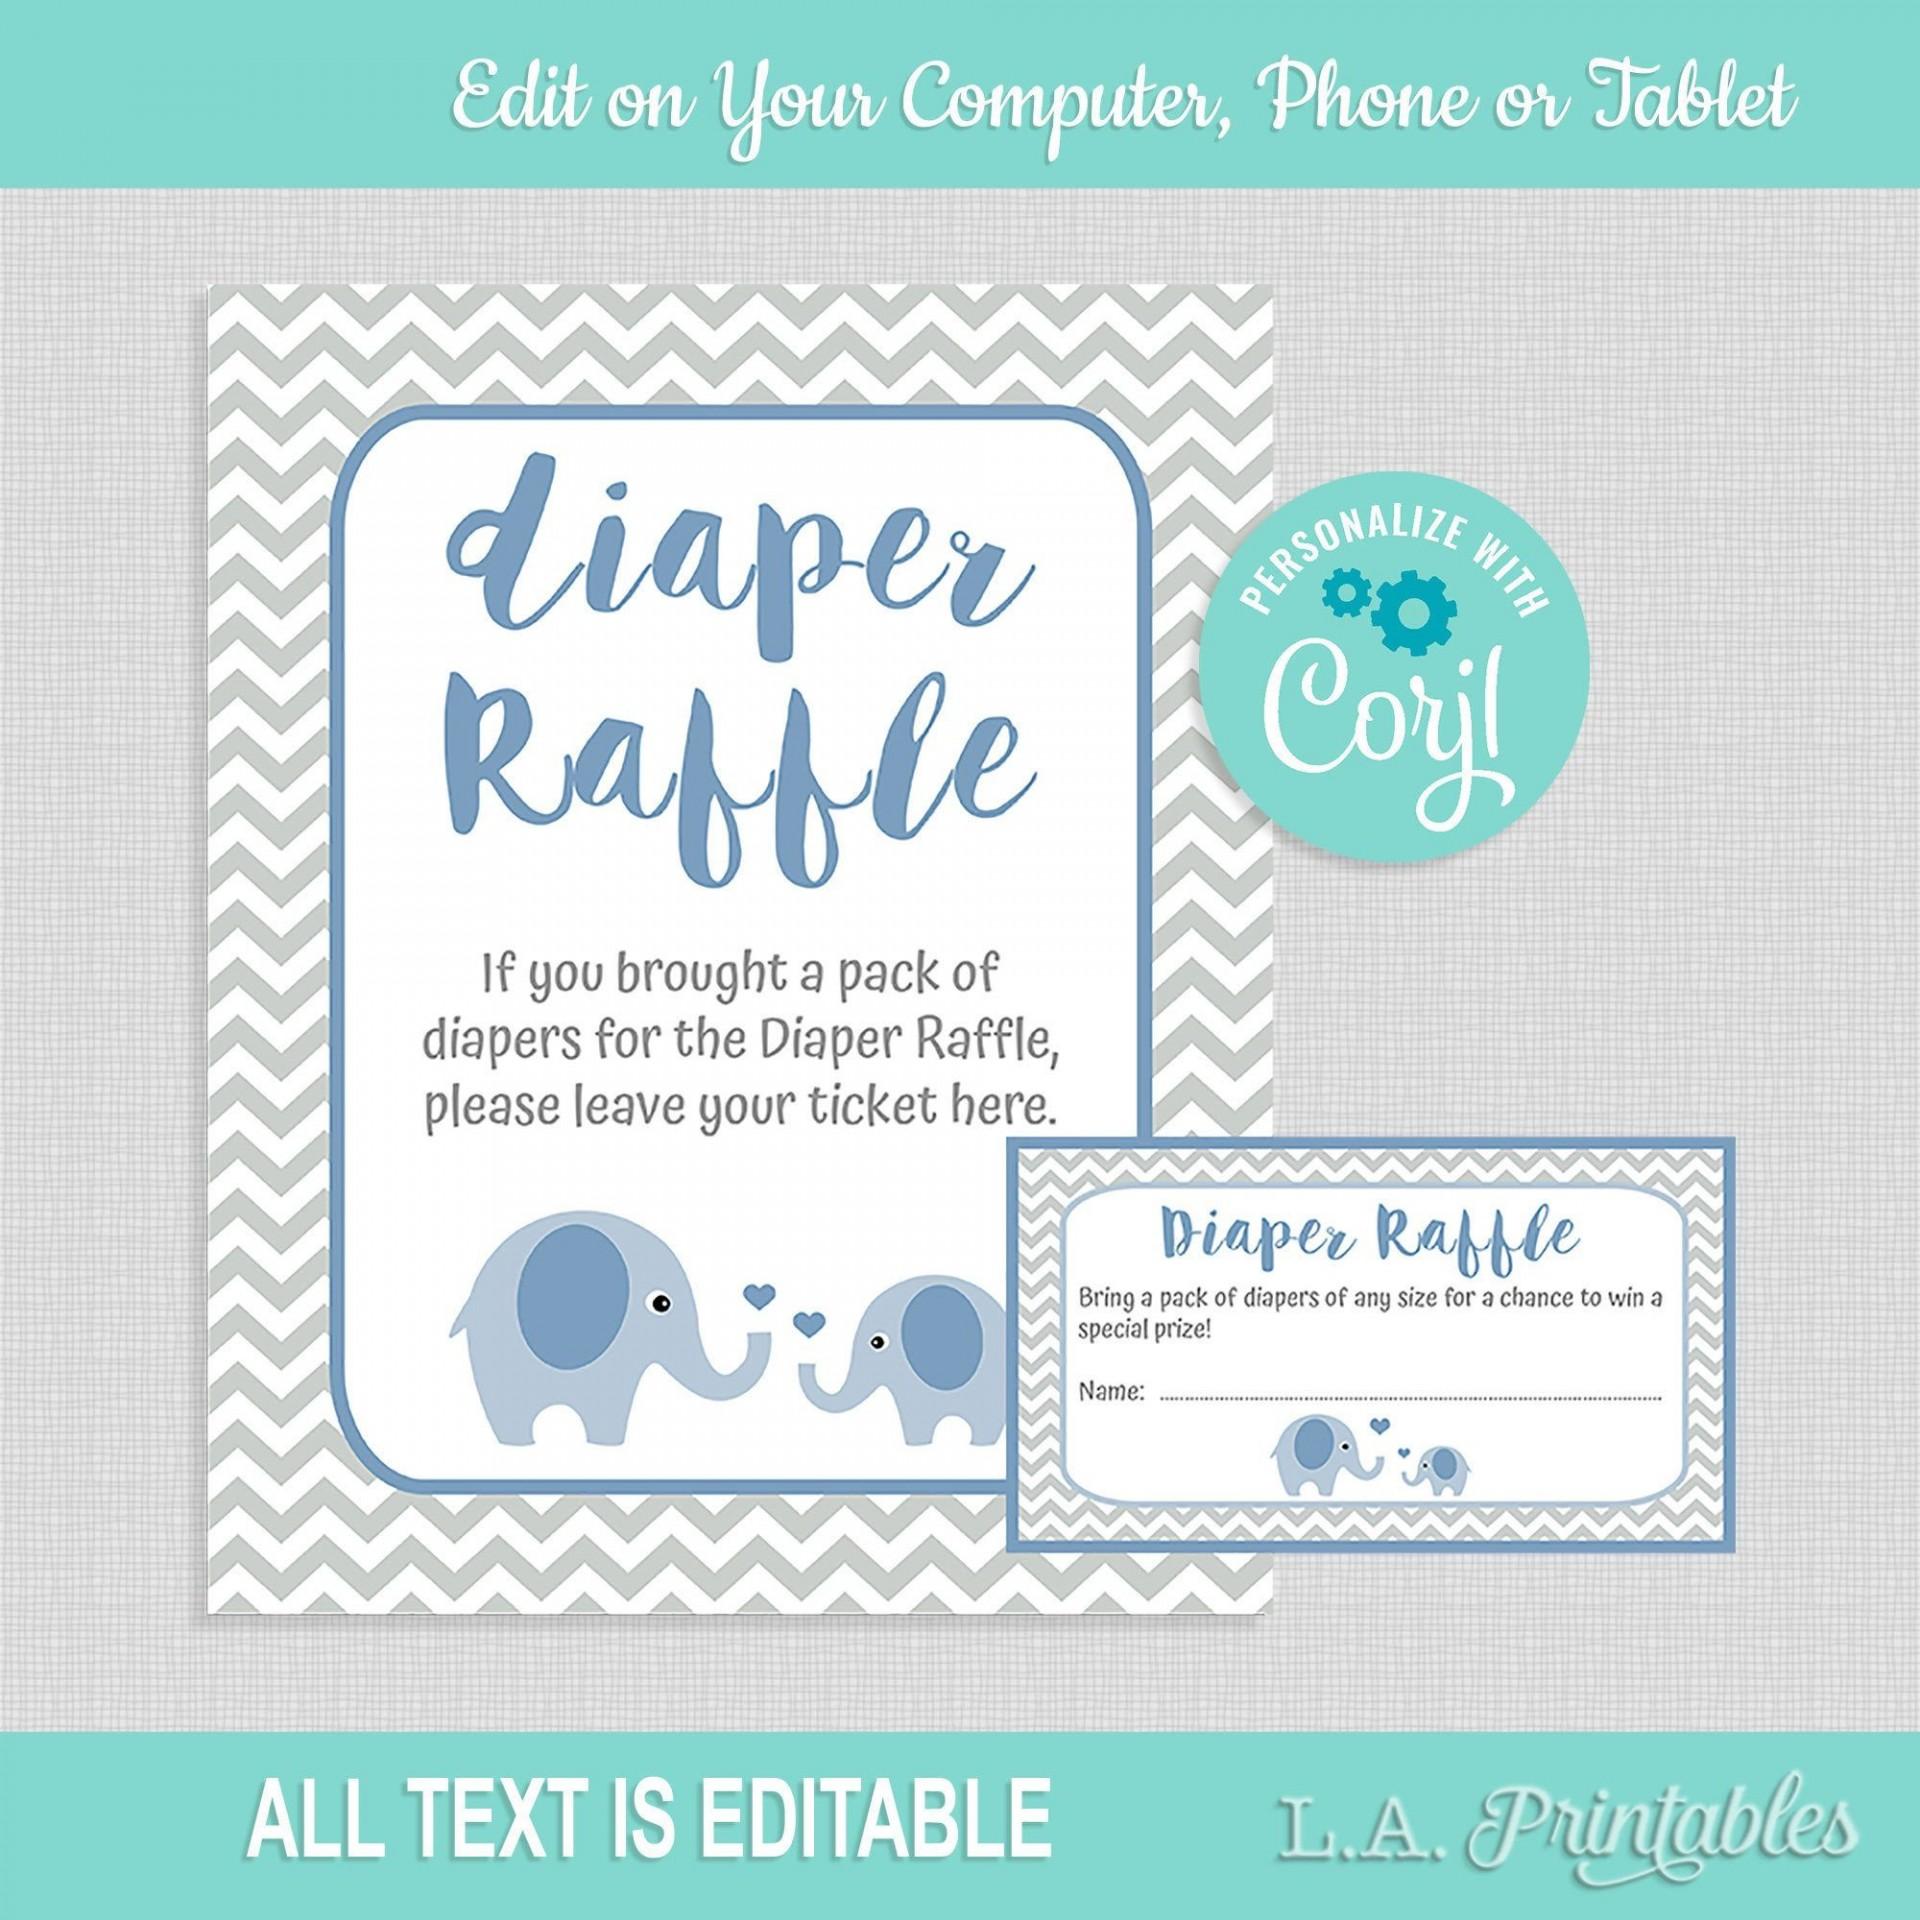 007 Top Diaper Raffle Ticket Template Sample  Free Printable Download1920